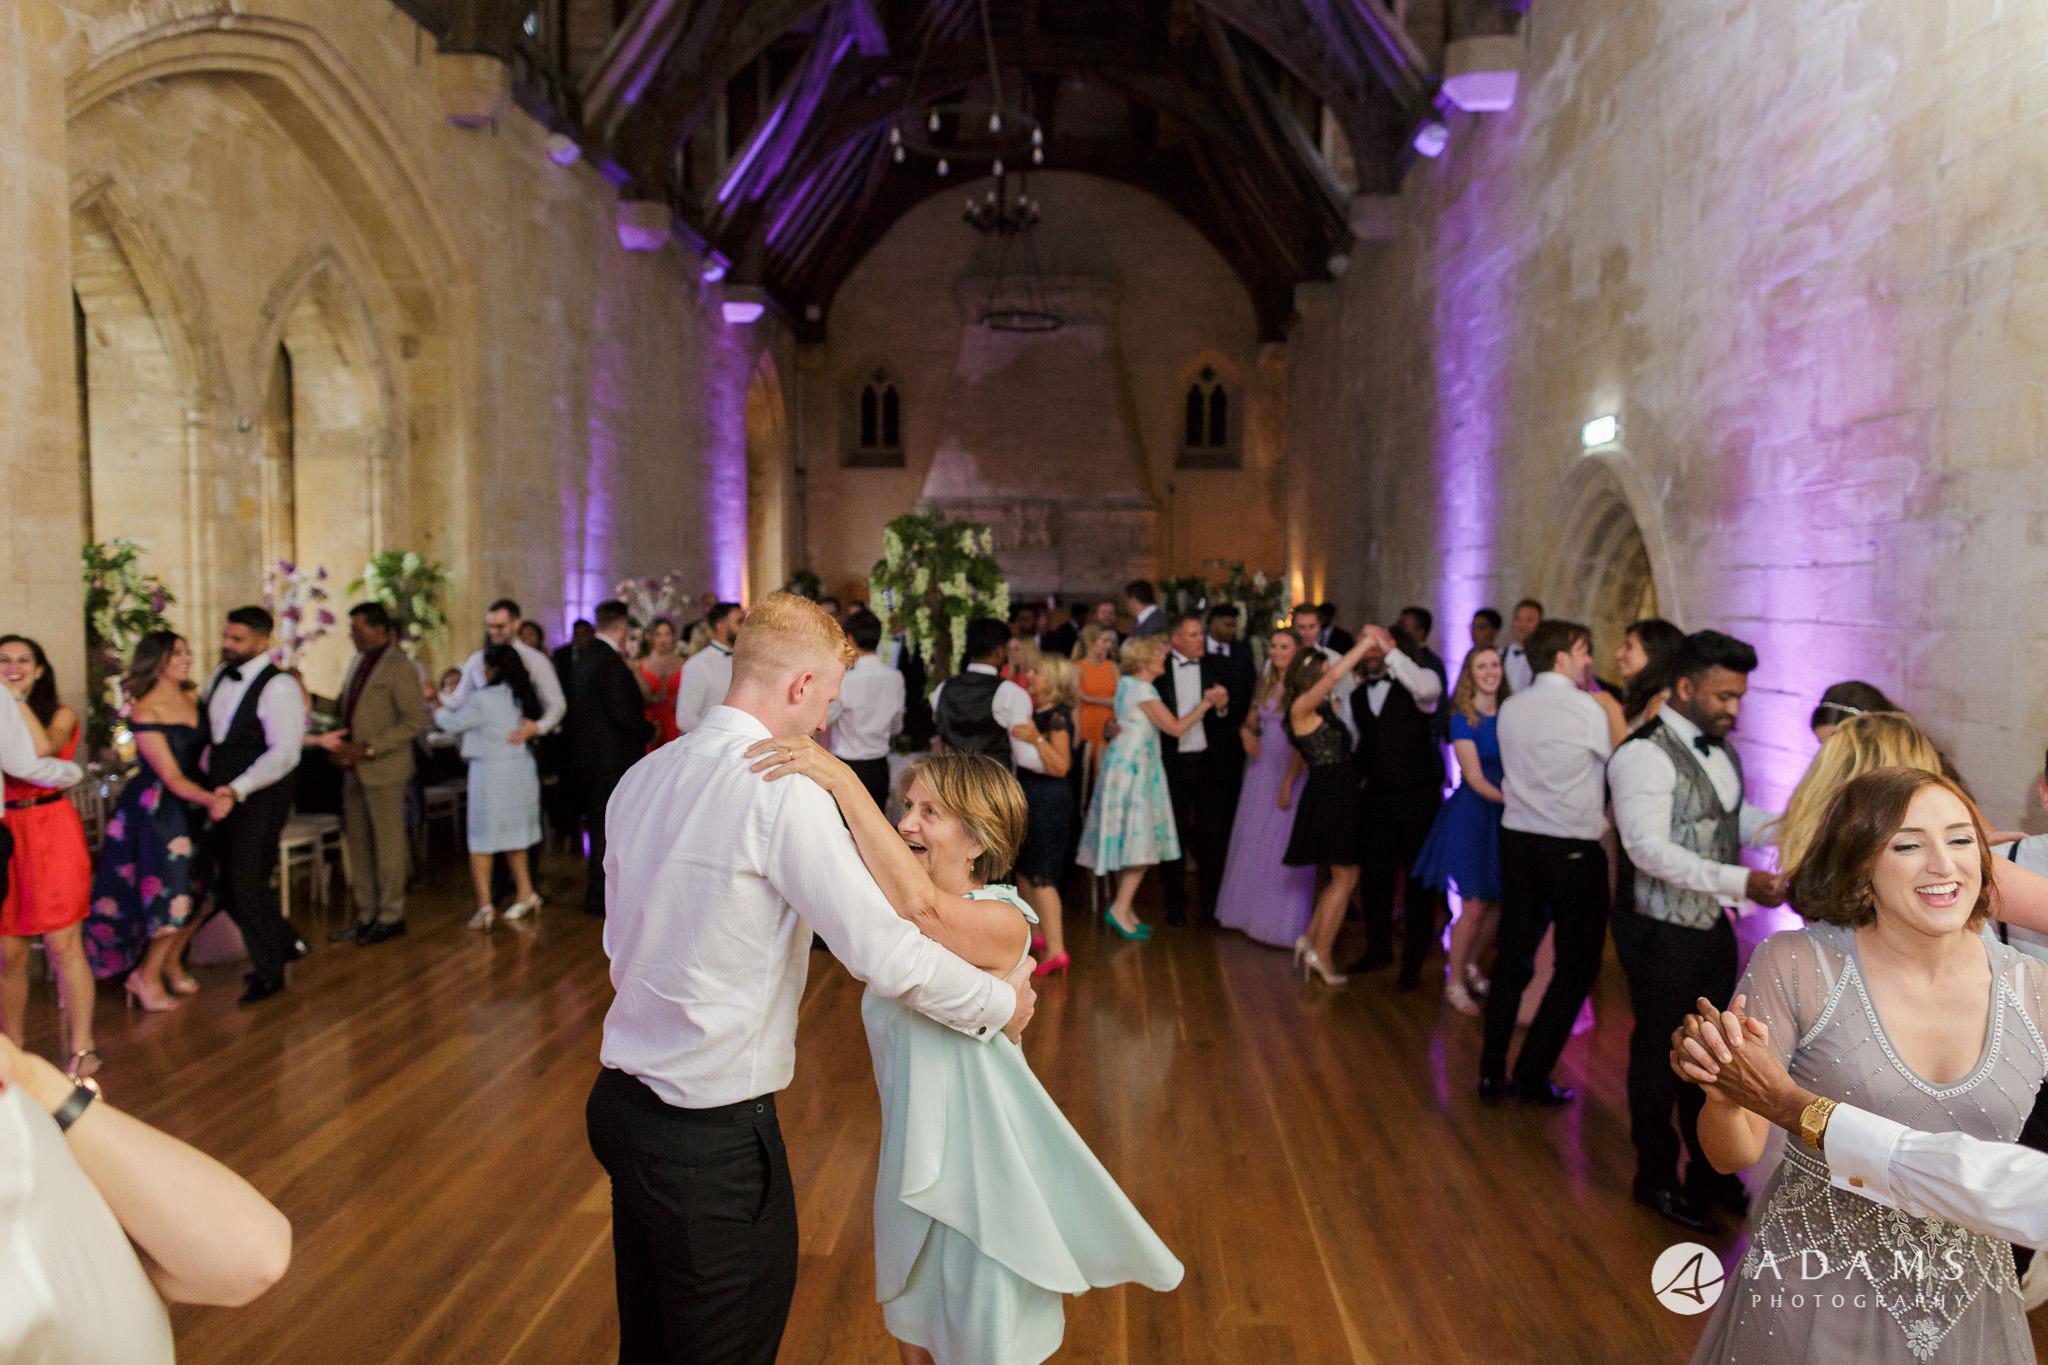 st donats castle wedding guests dancing